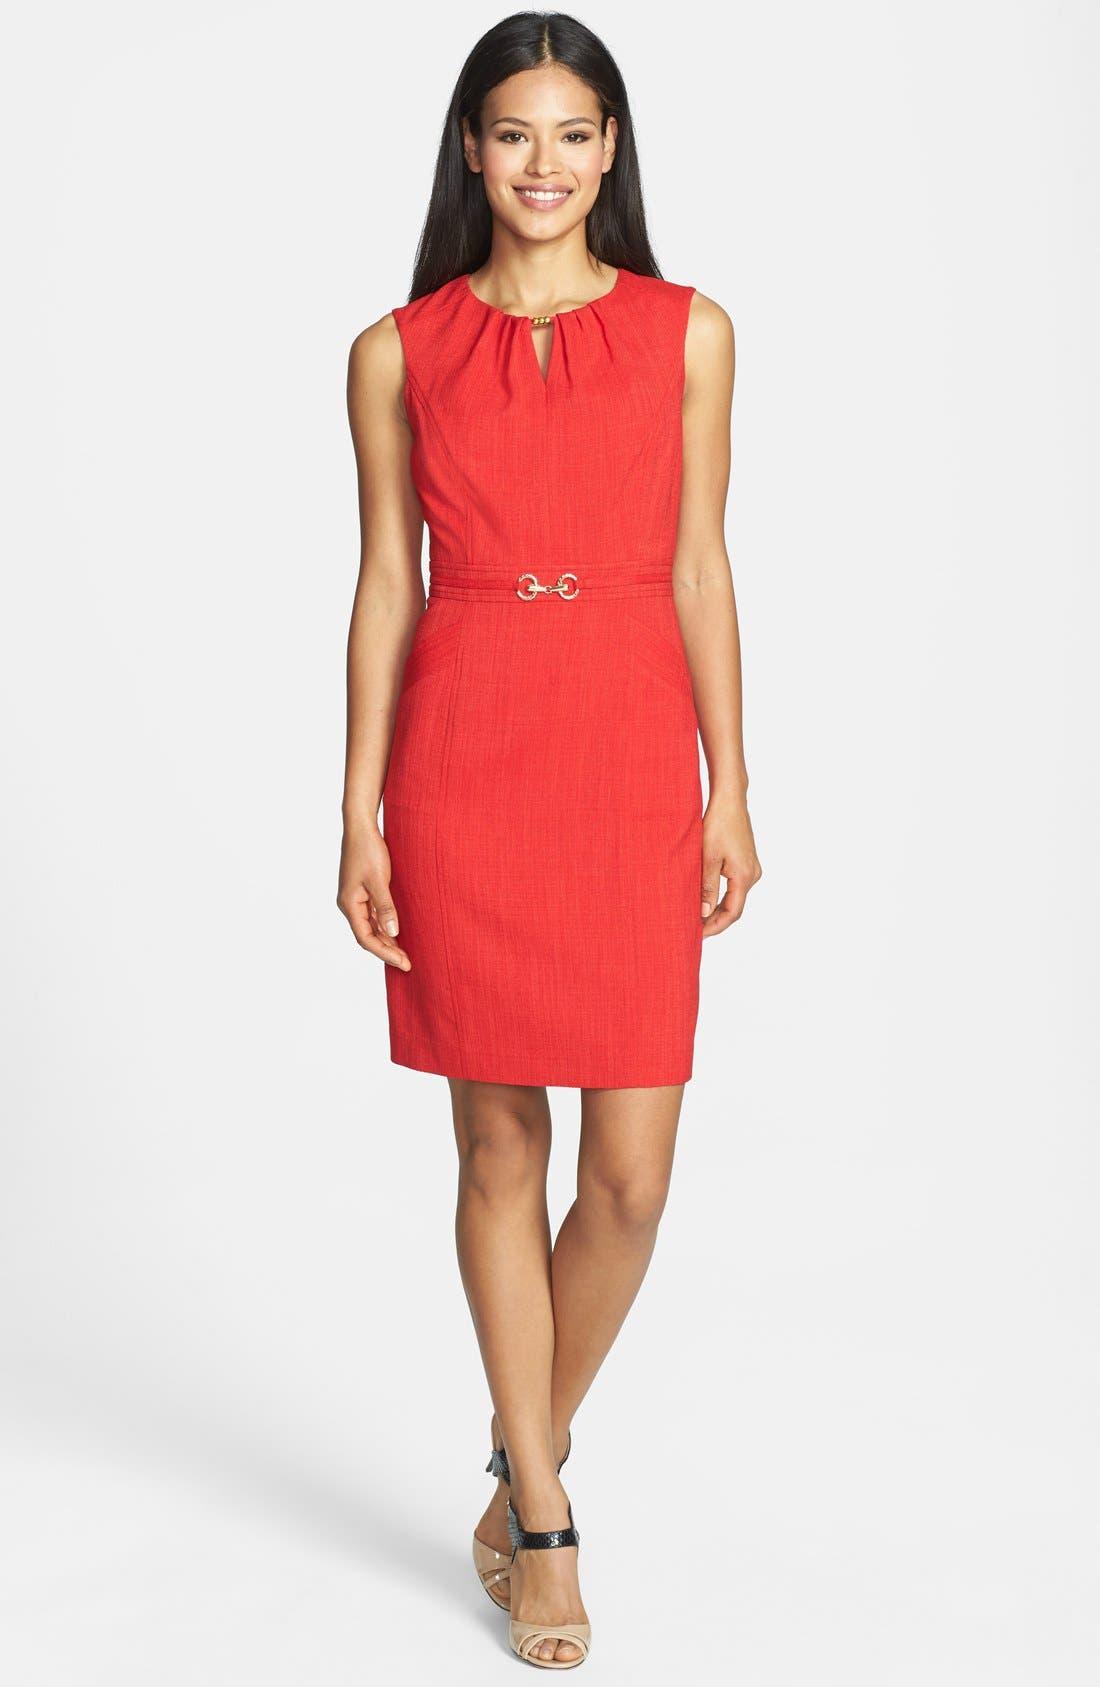 Alternate Image 1 Selected - Ellen Tracy Hardware Embellished Sheath Dress